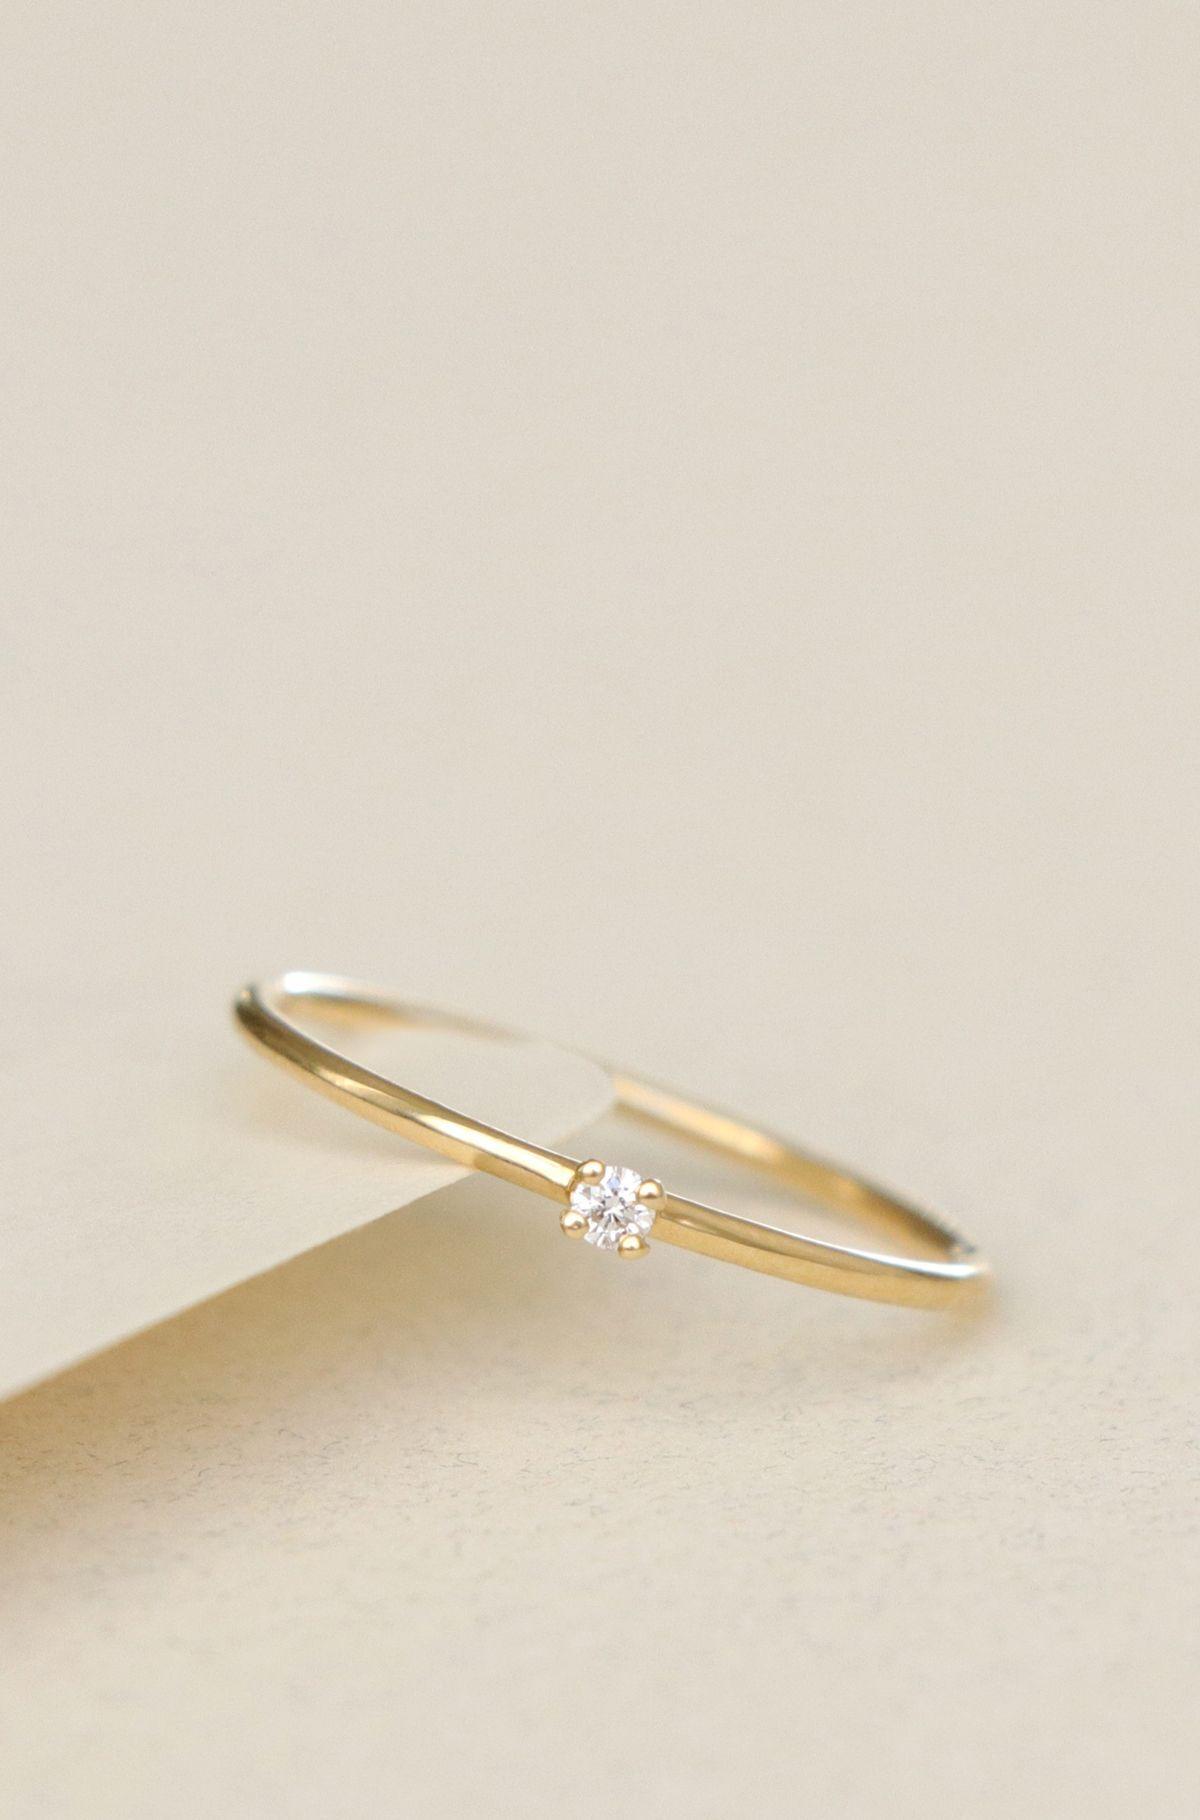 Vow vrai u oro wedding promise ring simple tiny diamond